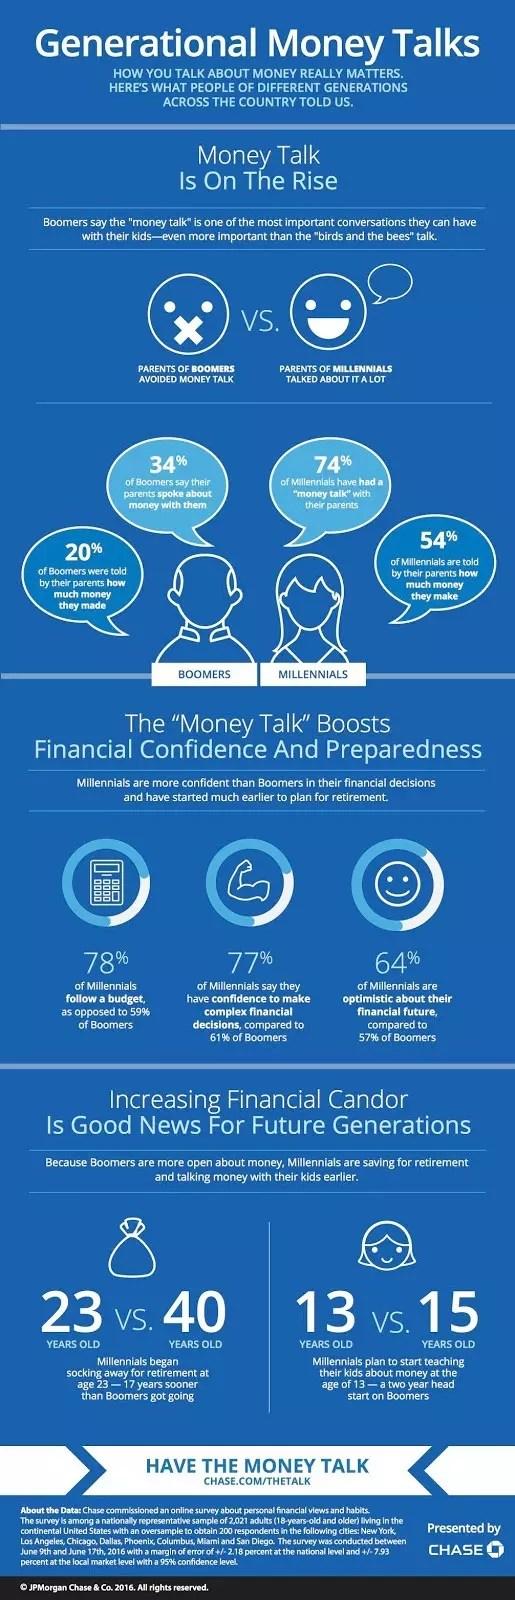 Chase Money Talks Infographic